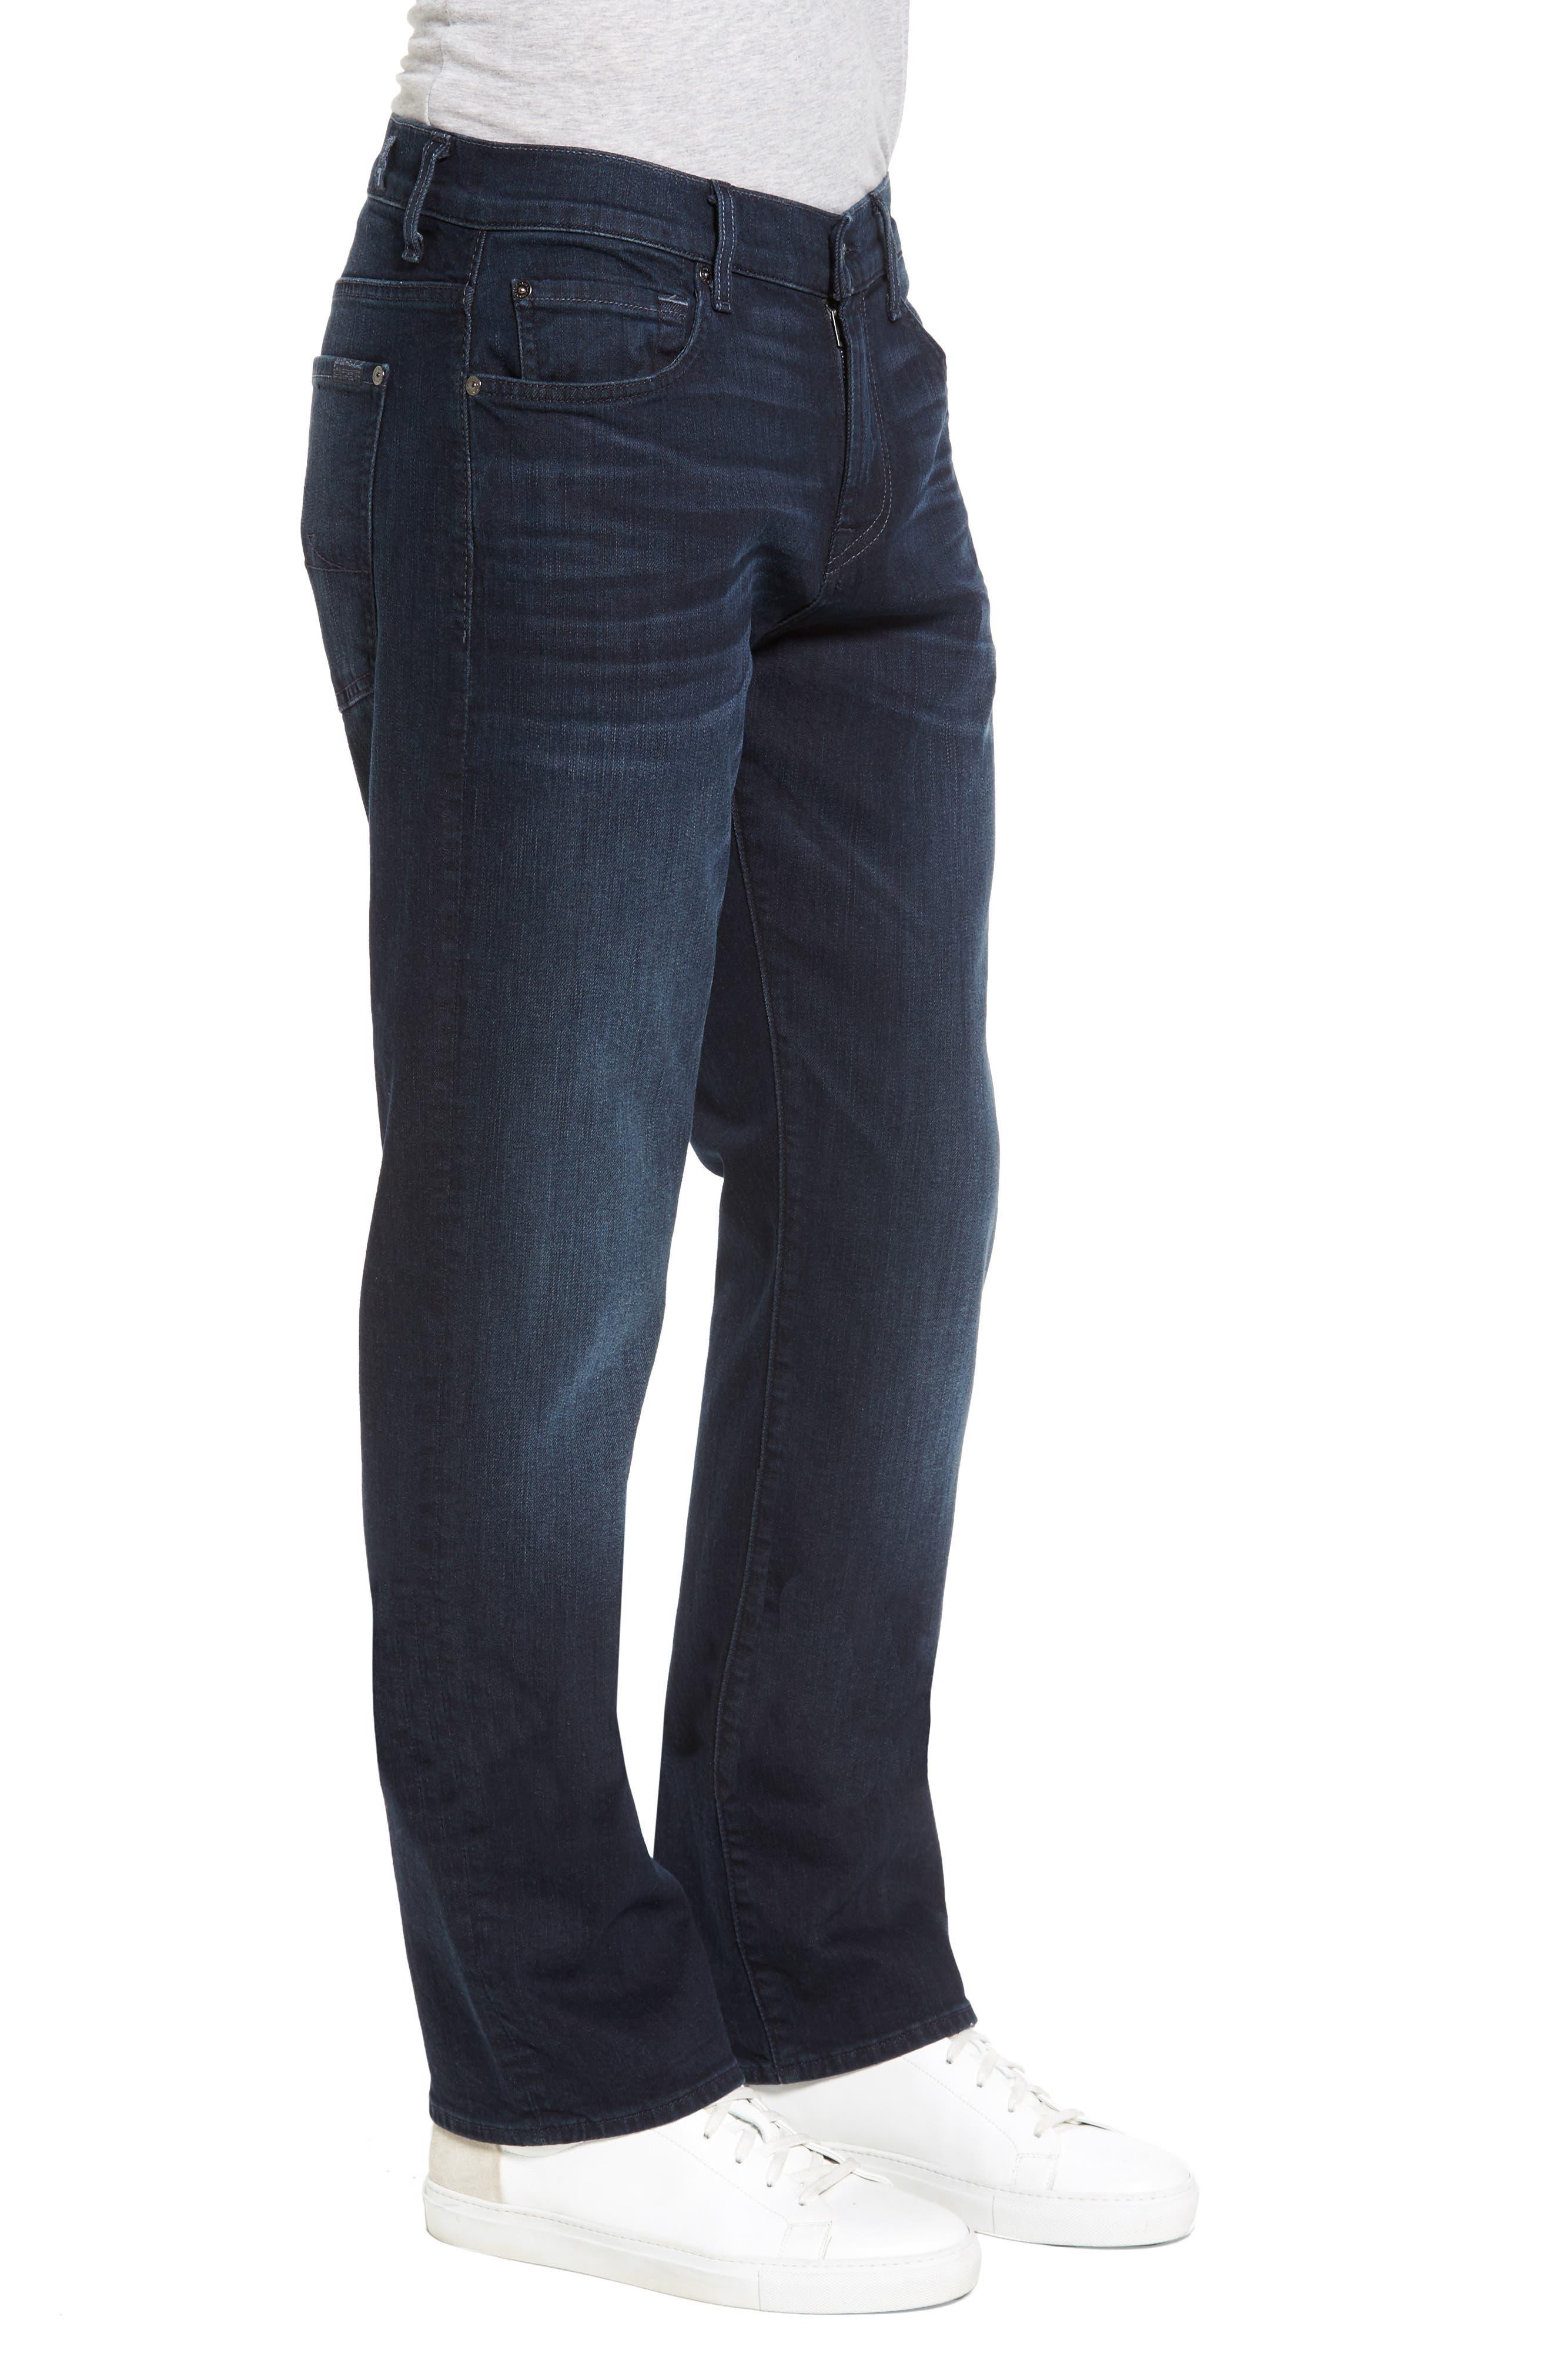 Luxe Performance - Carsen Straight Leg Jeans,                             Alternate thumbnail 3, color,                             Dark Current